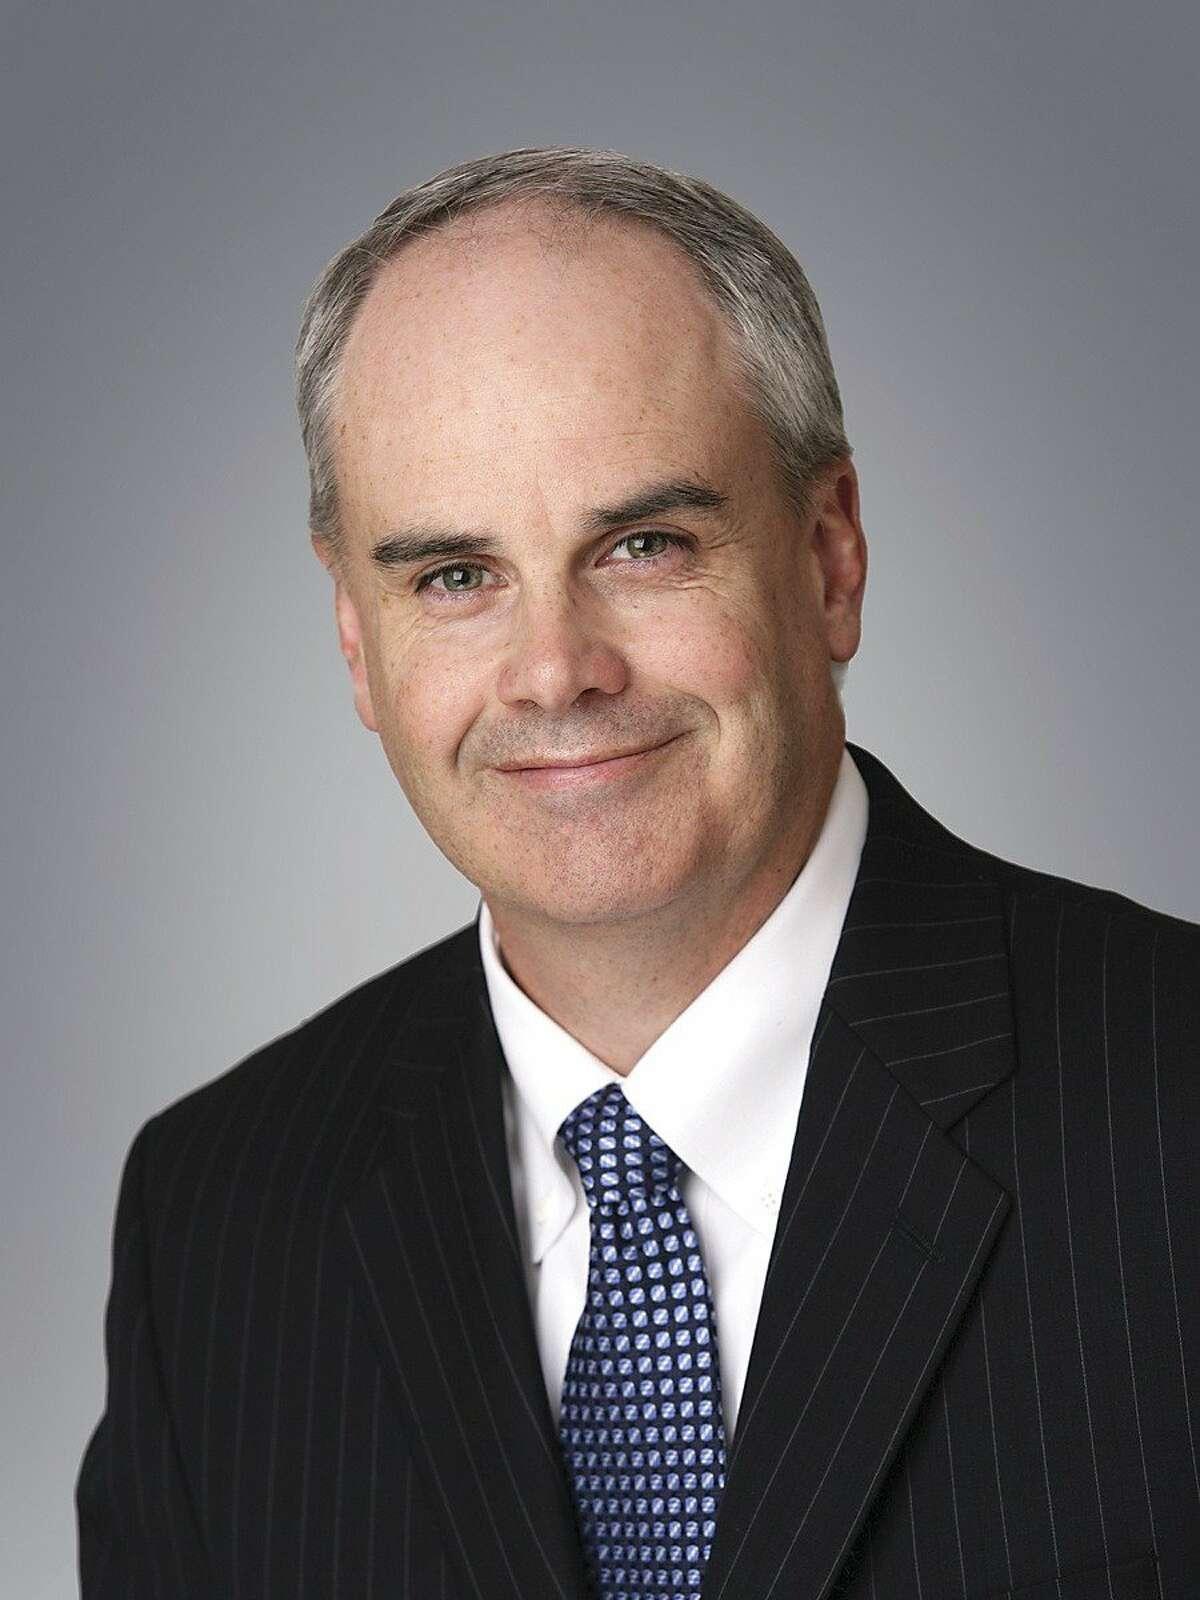 Mechanics Bank named Scott Givans chief credit and risk officer.